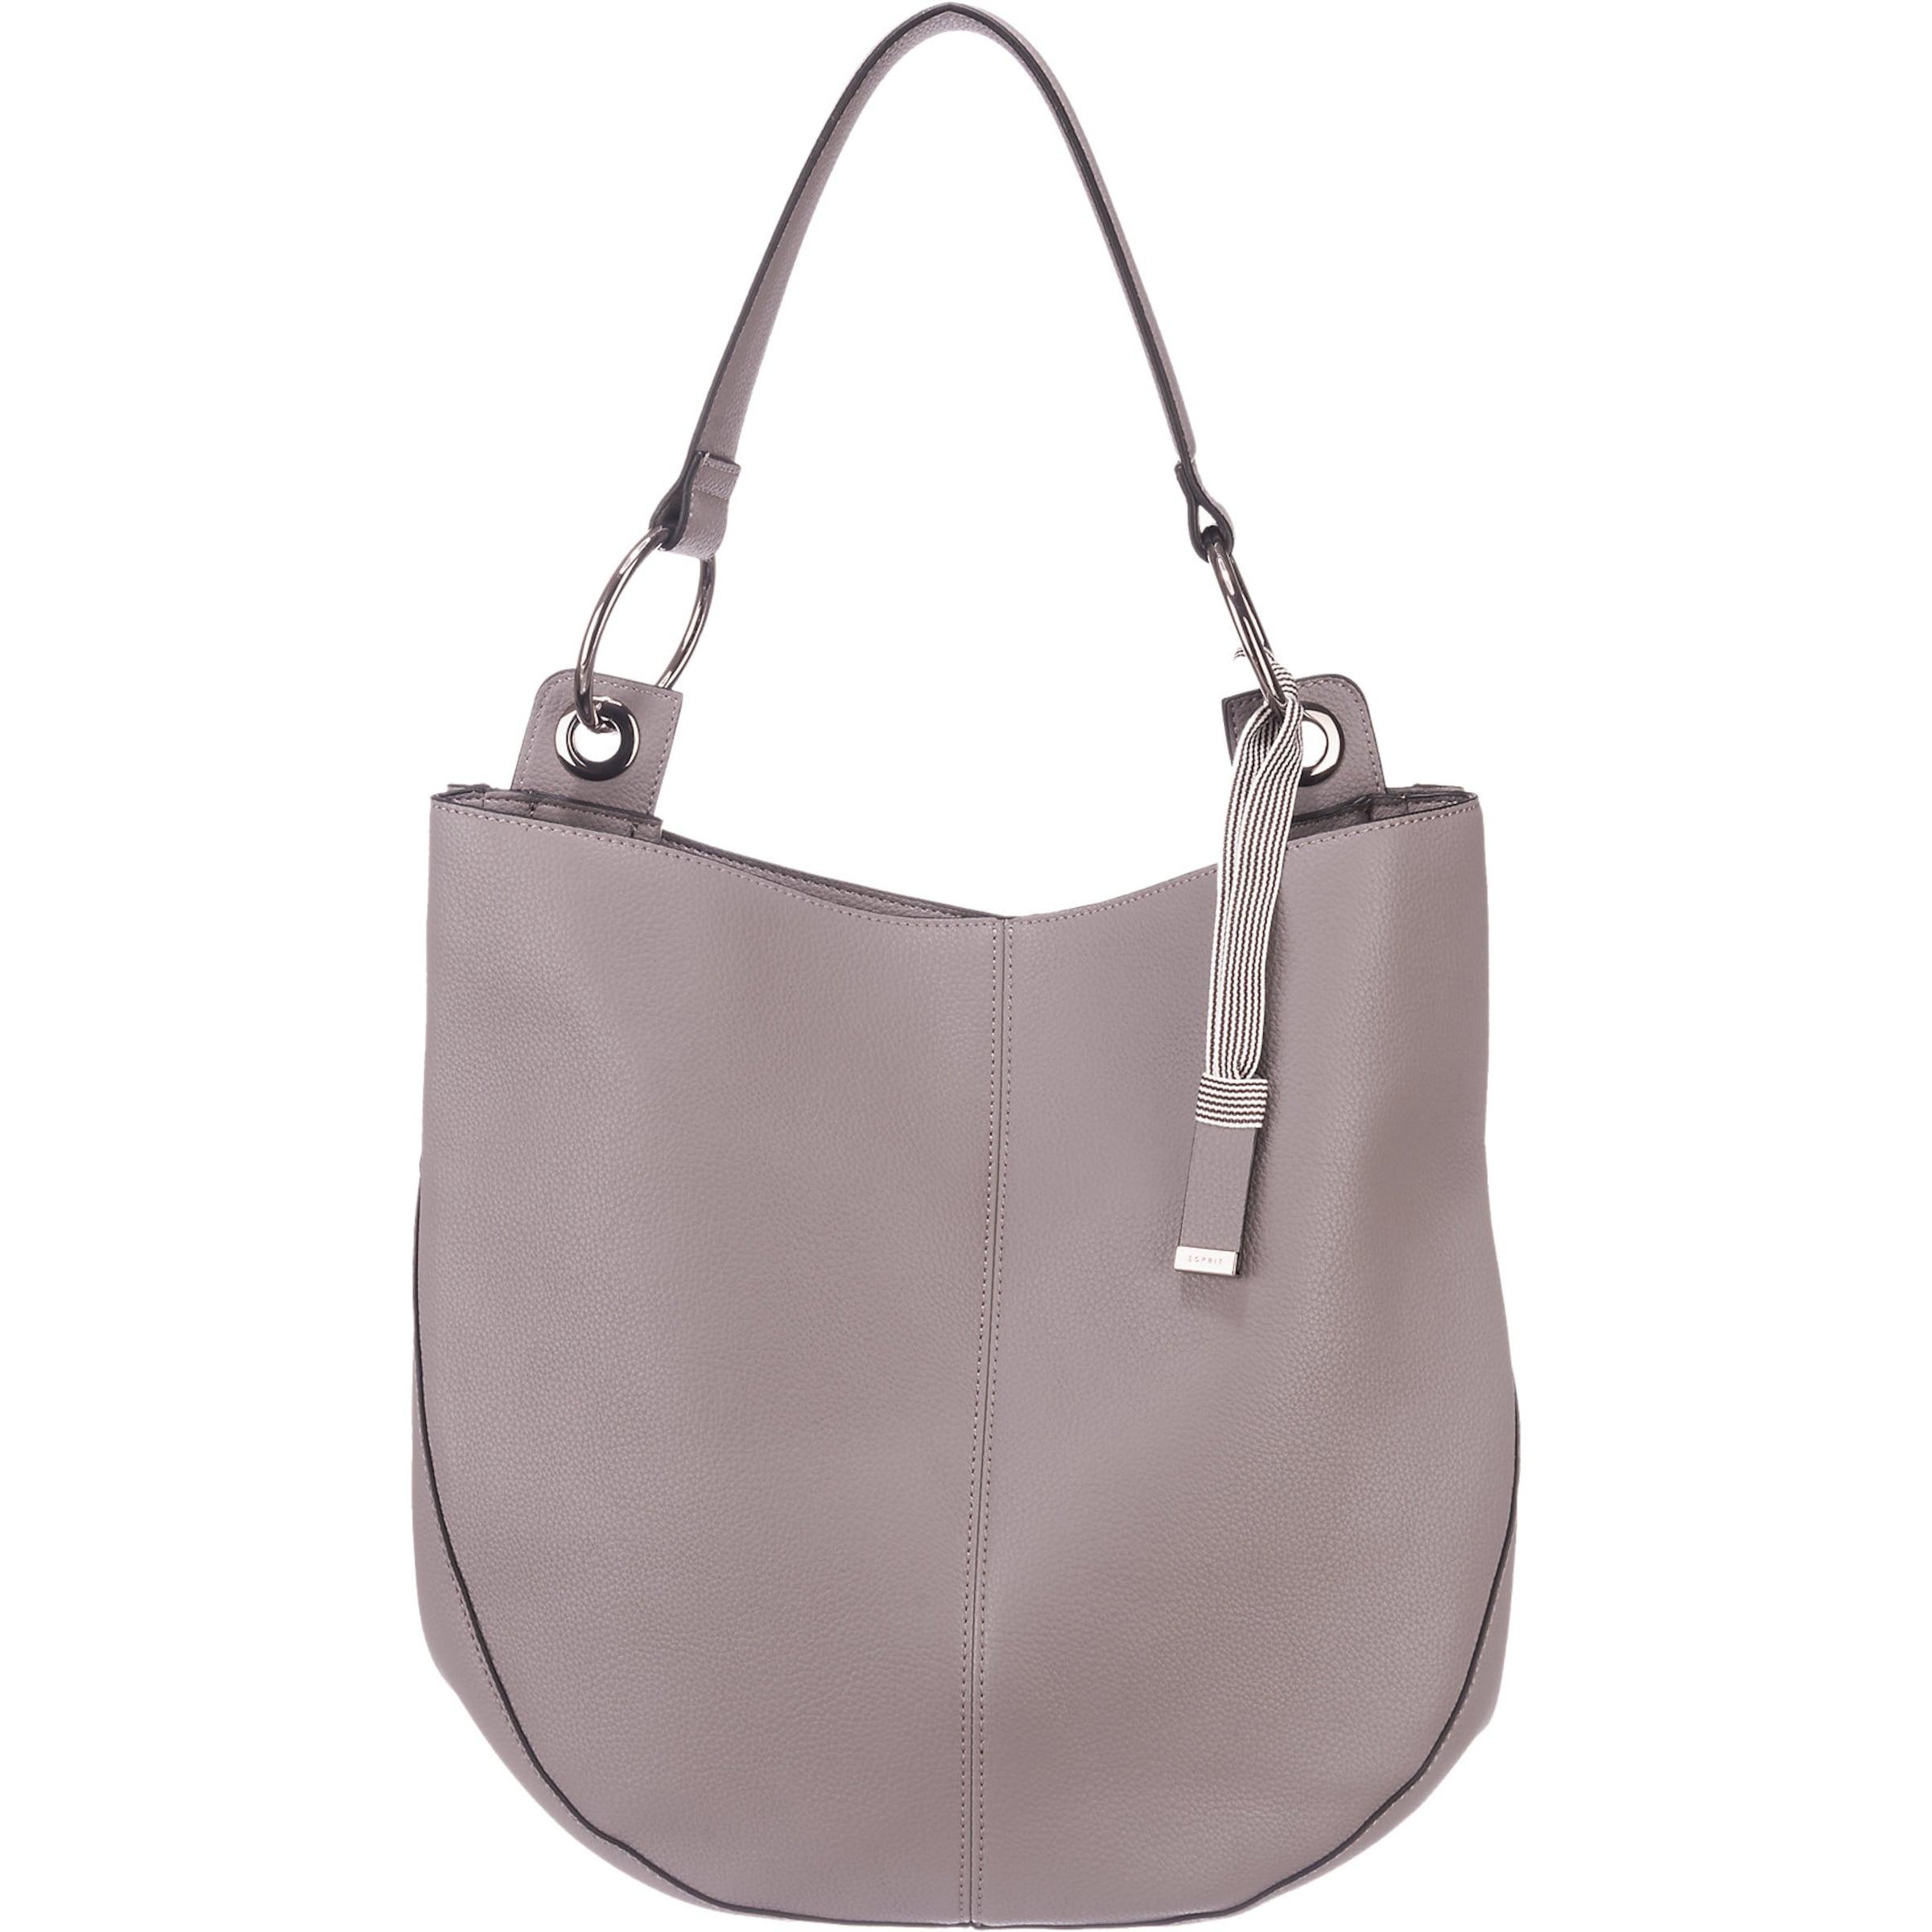 Handtasche ESPRIT Handtasche ESPRIT ESPRIT Handtasche ESPRIT ESPRIT ESPRIT ESPRIT Handtasche Handtasche Handtasche Handtasche ESPRIT Handtasche ESPRIT nxqOwCX